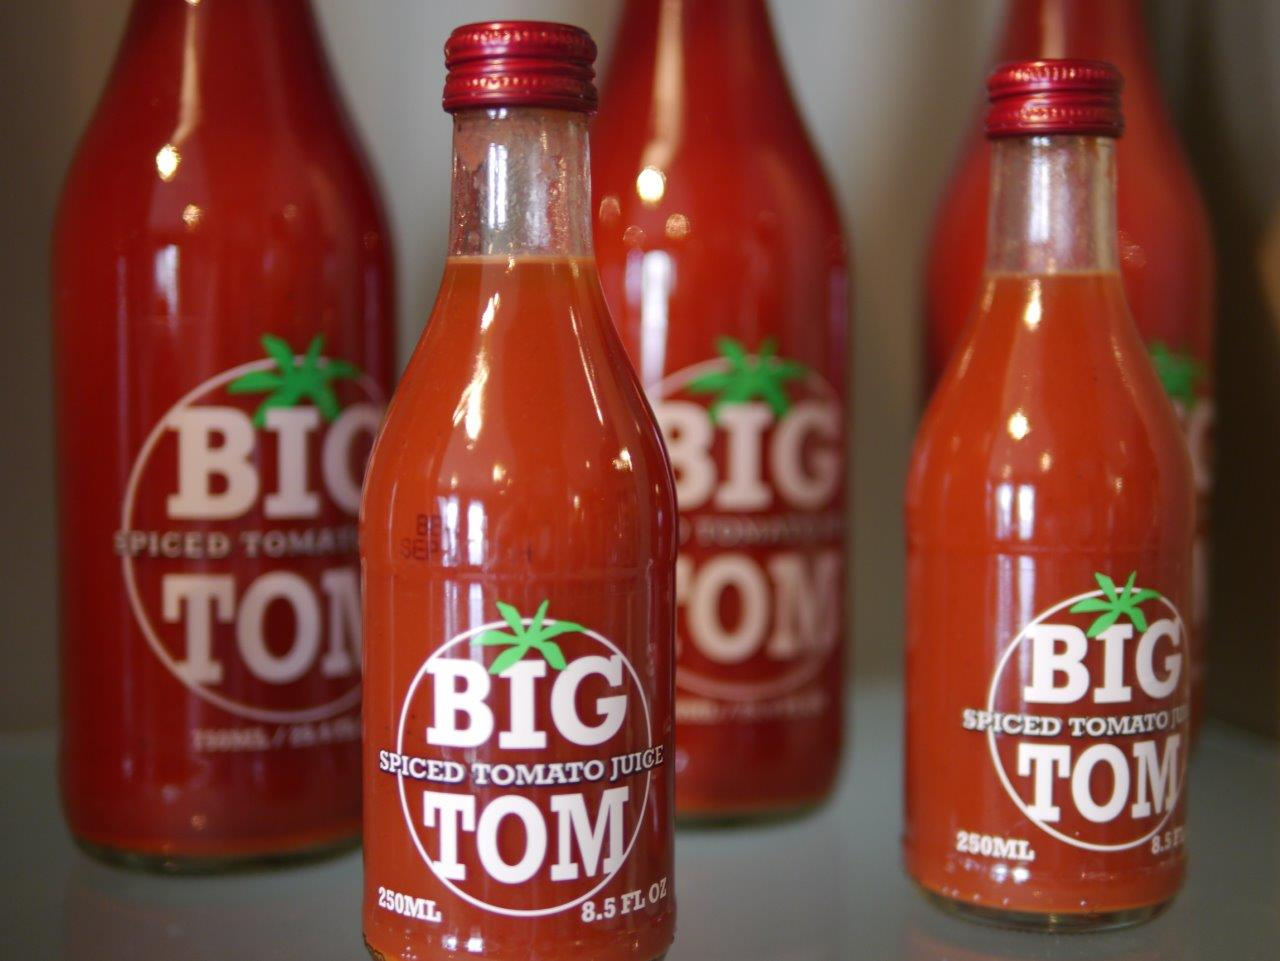 East+Bay+Clothiers++Big+Tom+Spiced+Tomato+Juice+Fairhope+AL.jpg